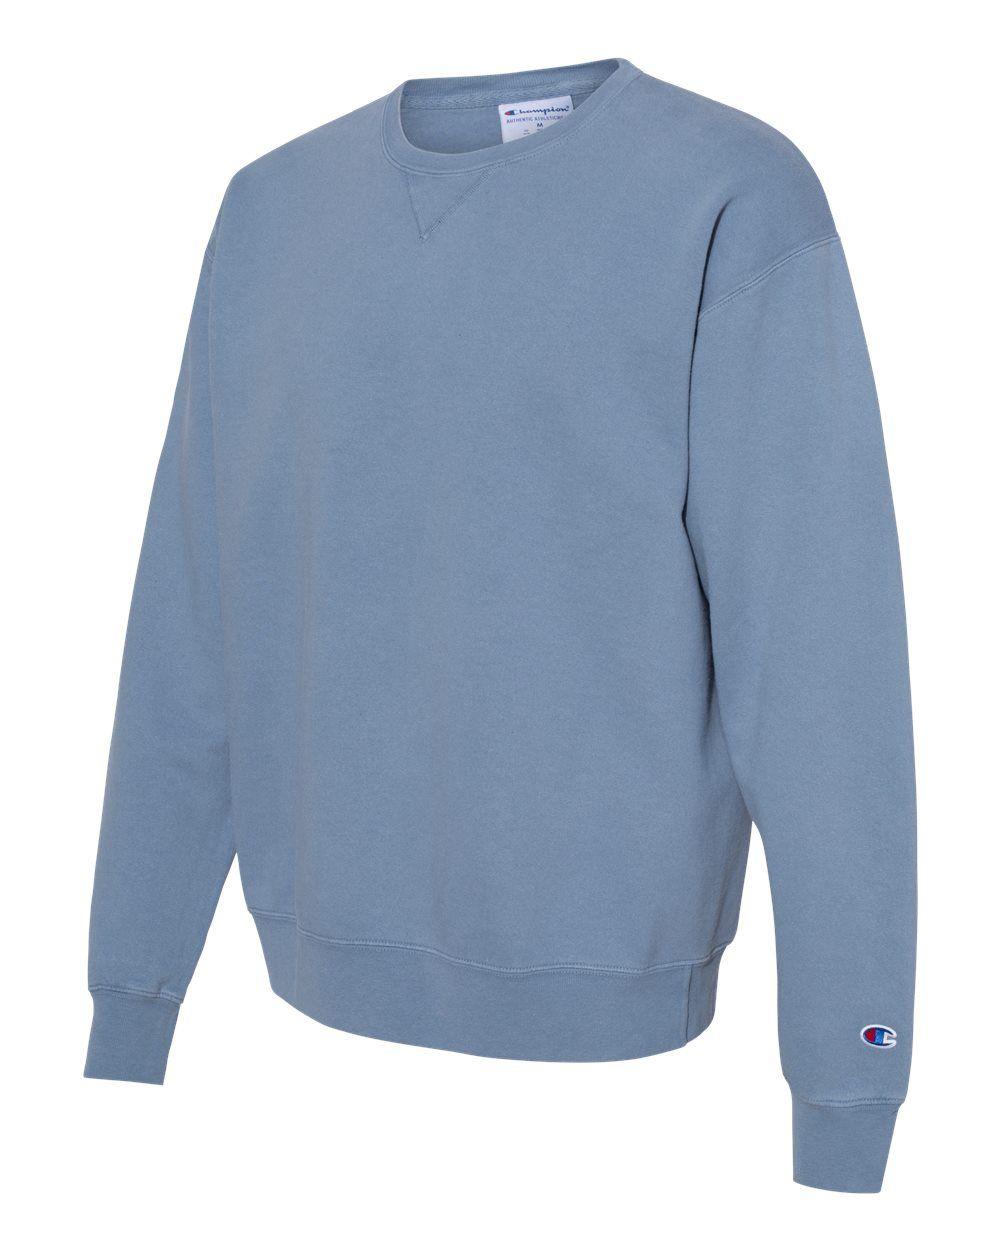 Champion Garment Dyed Crewneck Sweatshirt Cd400 Sweatshirts Crew Neck Sweatshirt Sweatshirt Fleece [ 1250 x 1000 Pixel ]